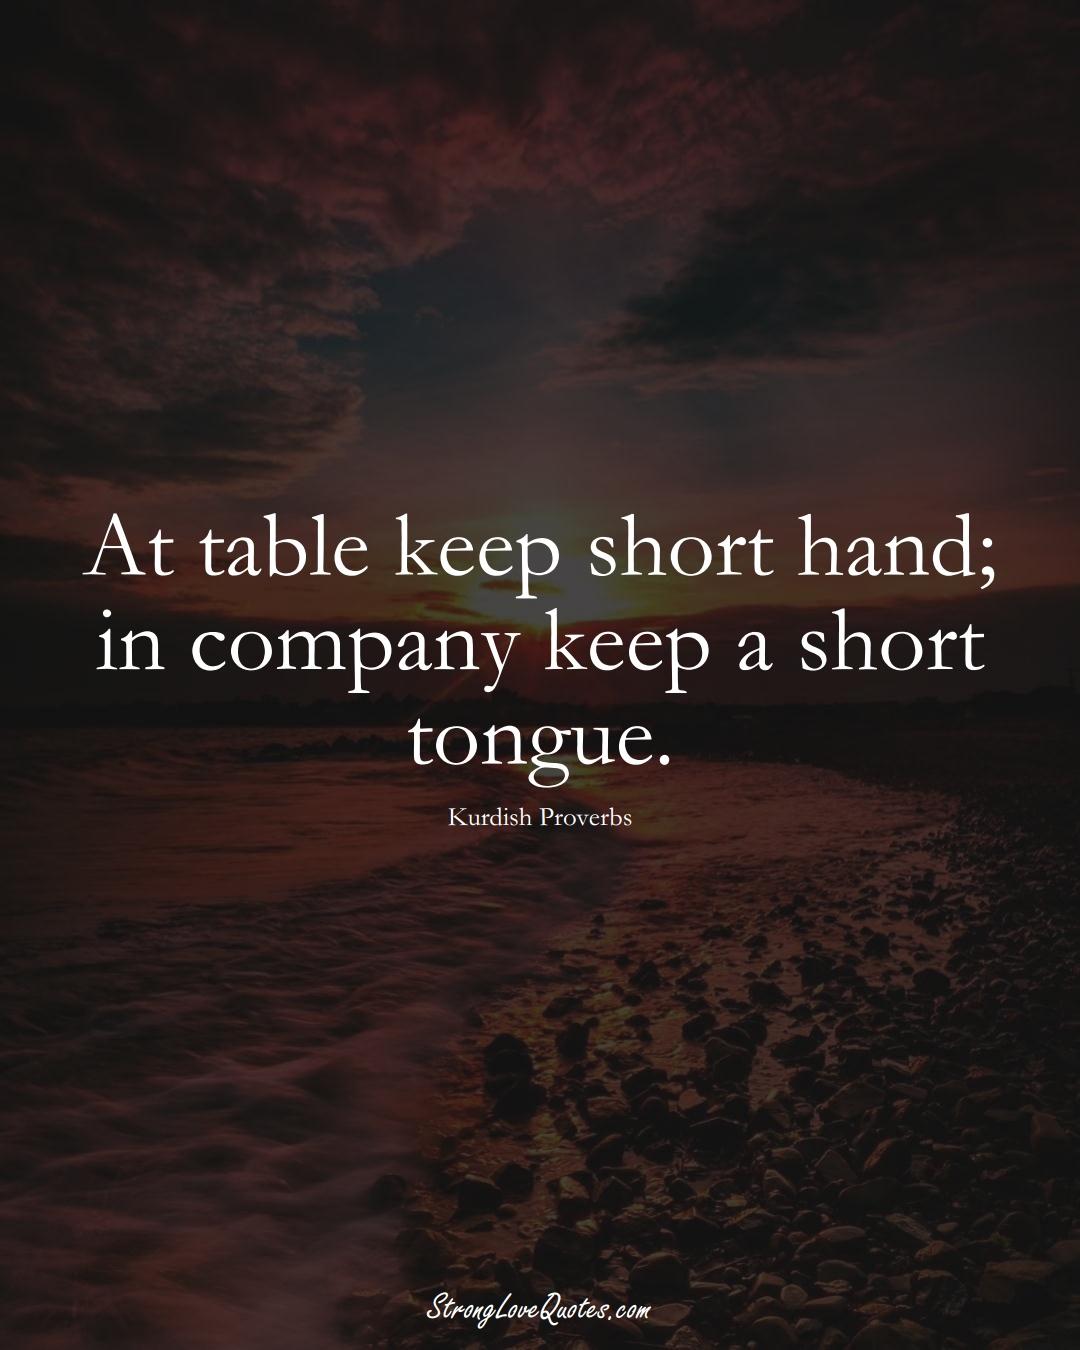 At table keep short hand; in company keep a short tongue. (Kurdish Sayings);  #aVarietyofCulturesSayings